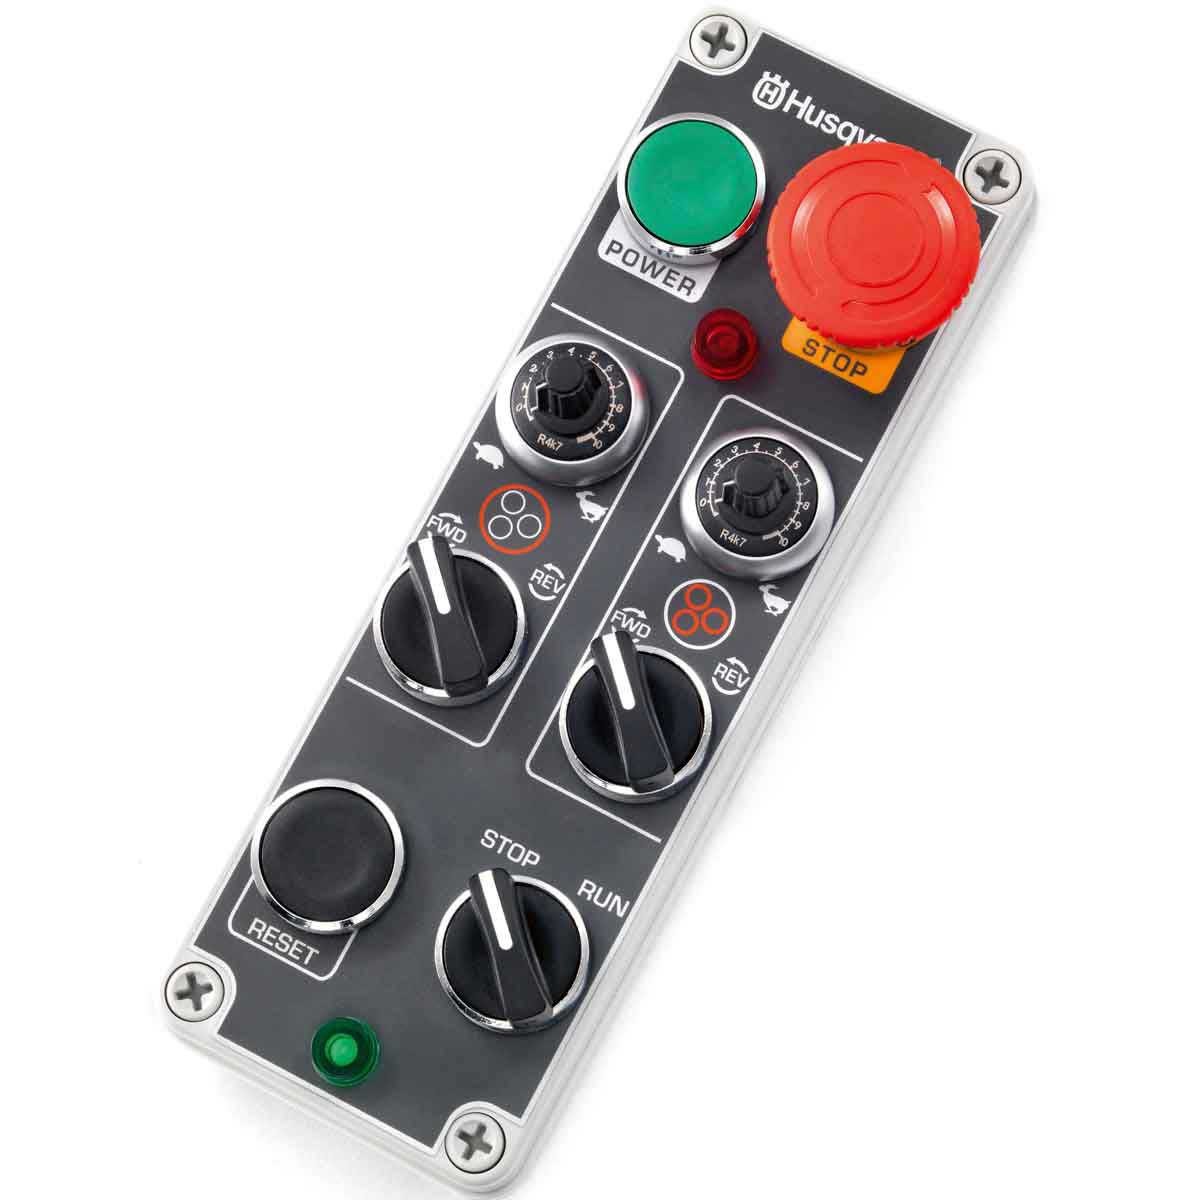 Husqvarna PG820 Grinder controls